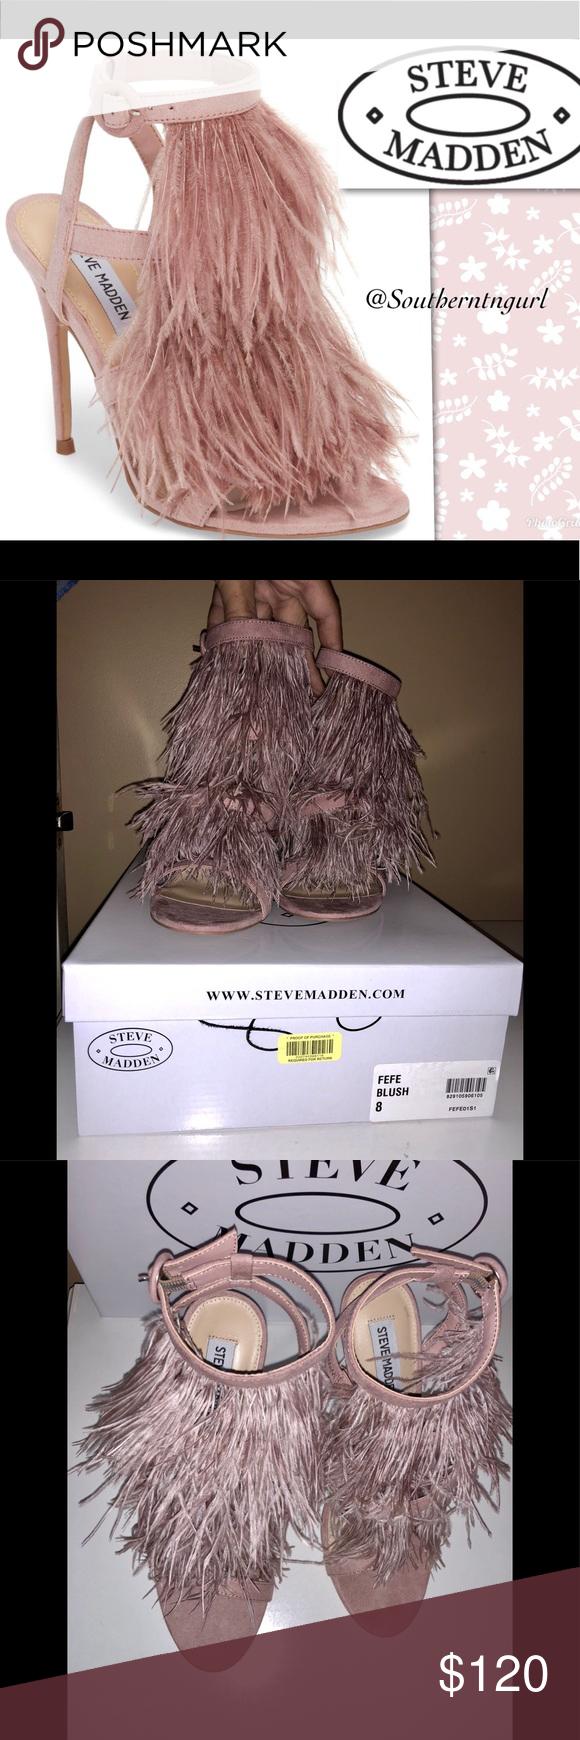 "b97f77675d8 NWT💜STEVE MADDEN💜""FeFe"" Feather Sandals Heels NWT💜STEVE MADDEN ..."